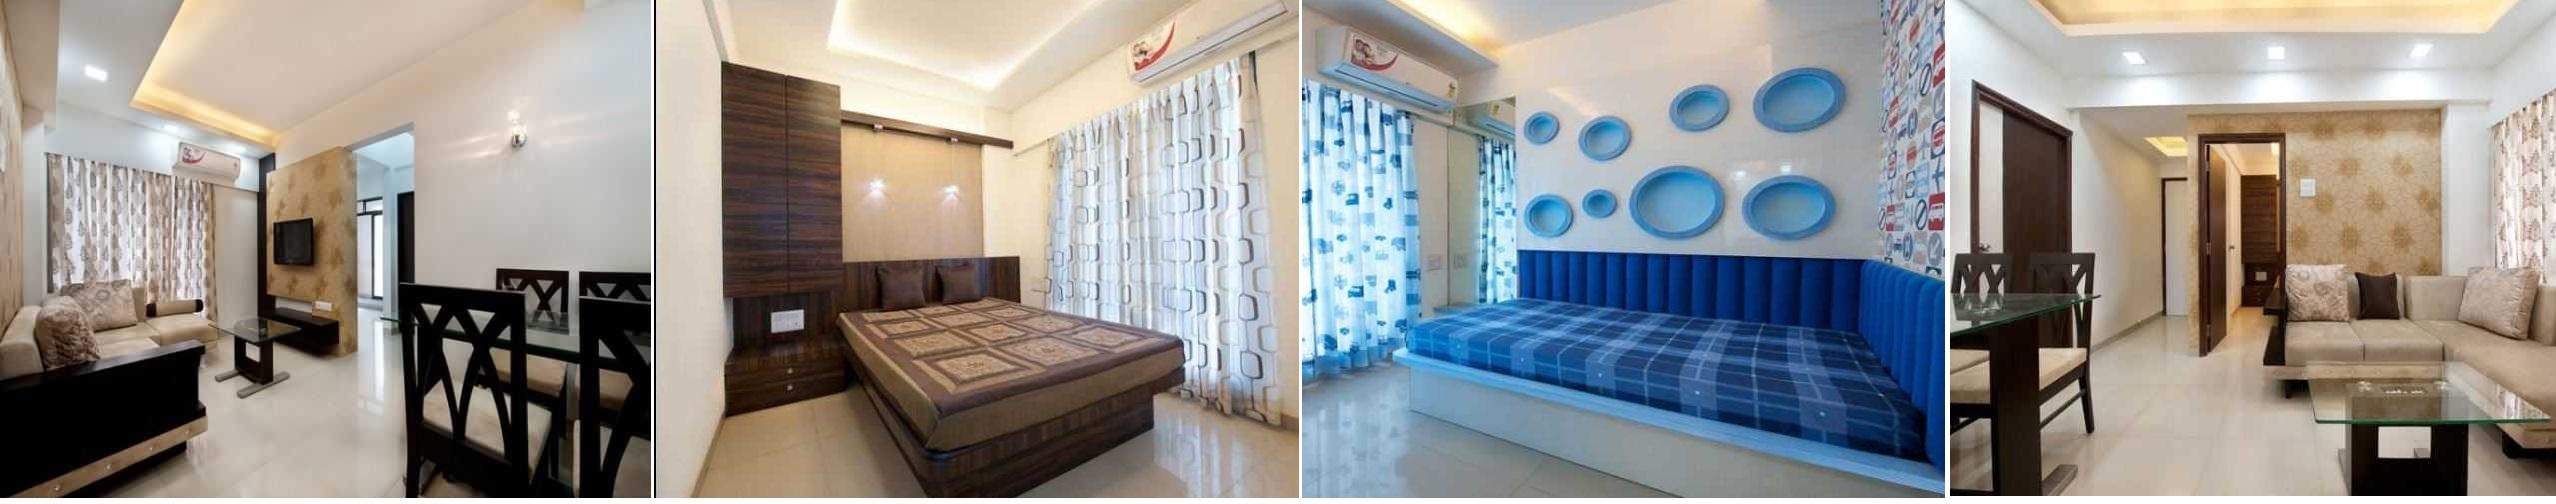 squarefeet orchid square phase 2 apartment interiors8